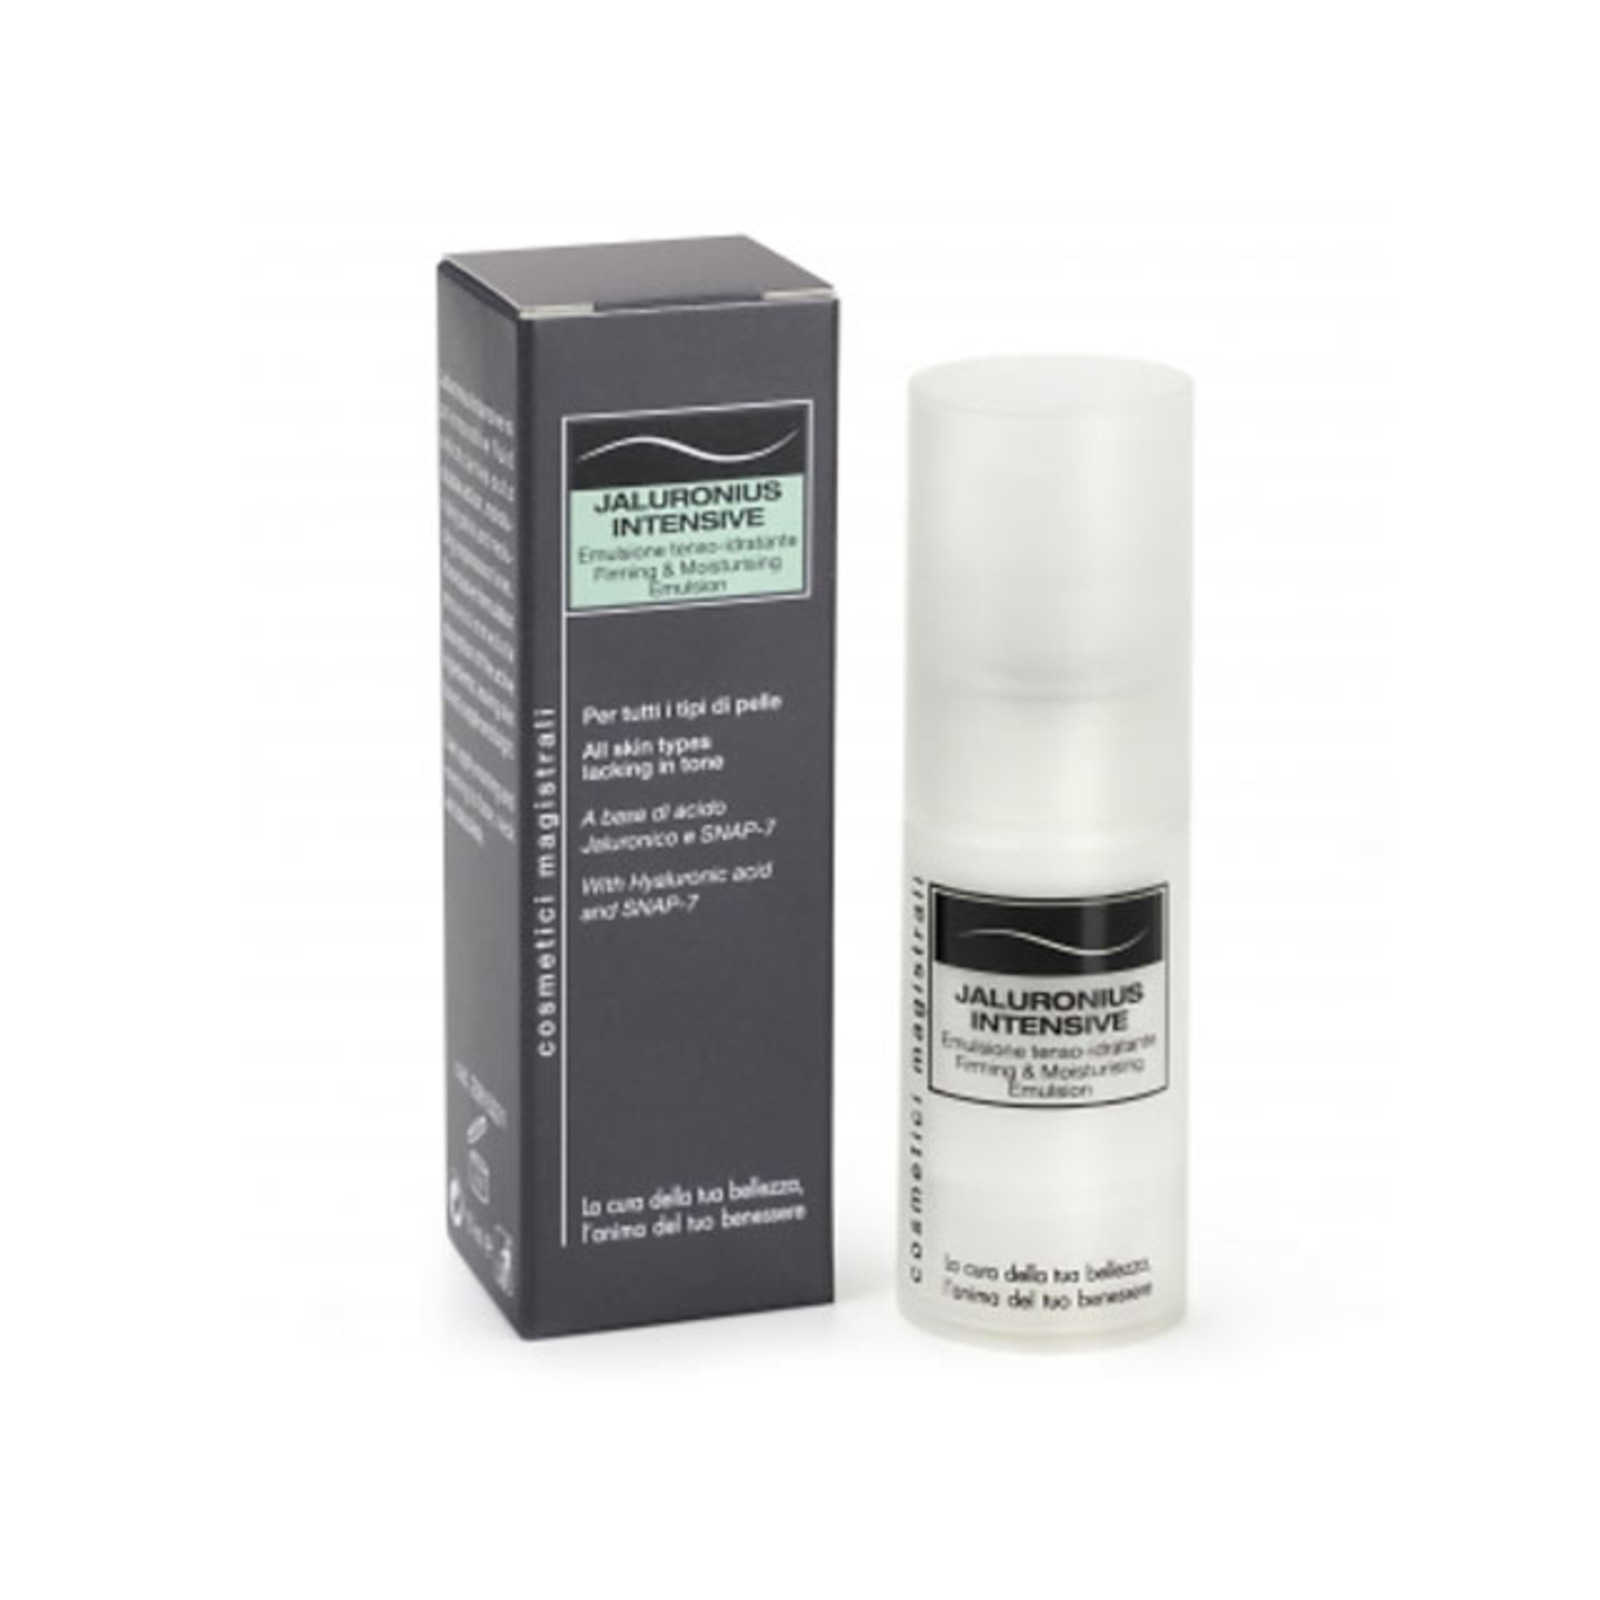 Cosmetici Magistrali - Jaluronius Intensive